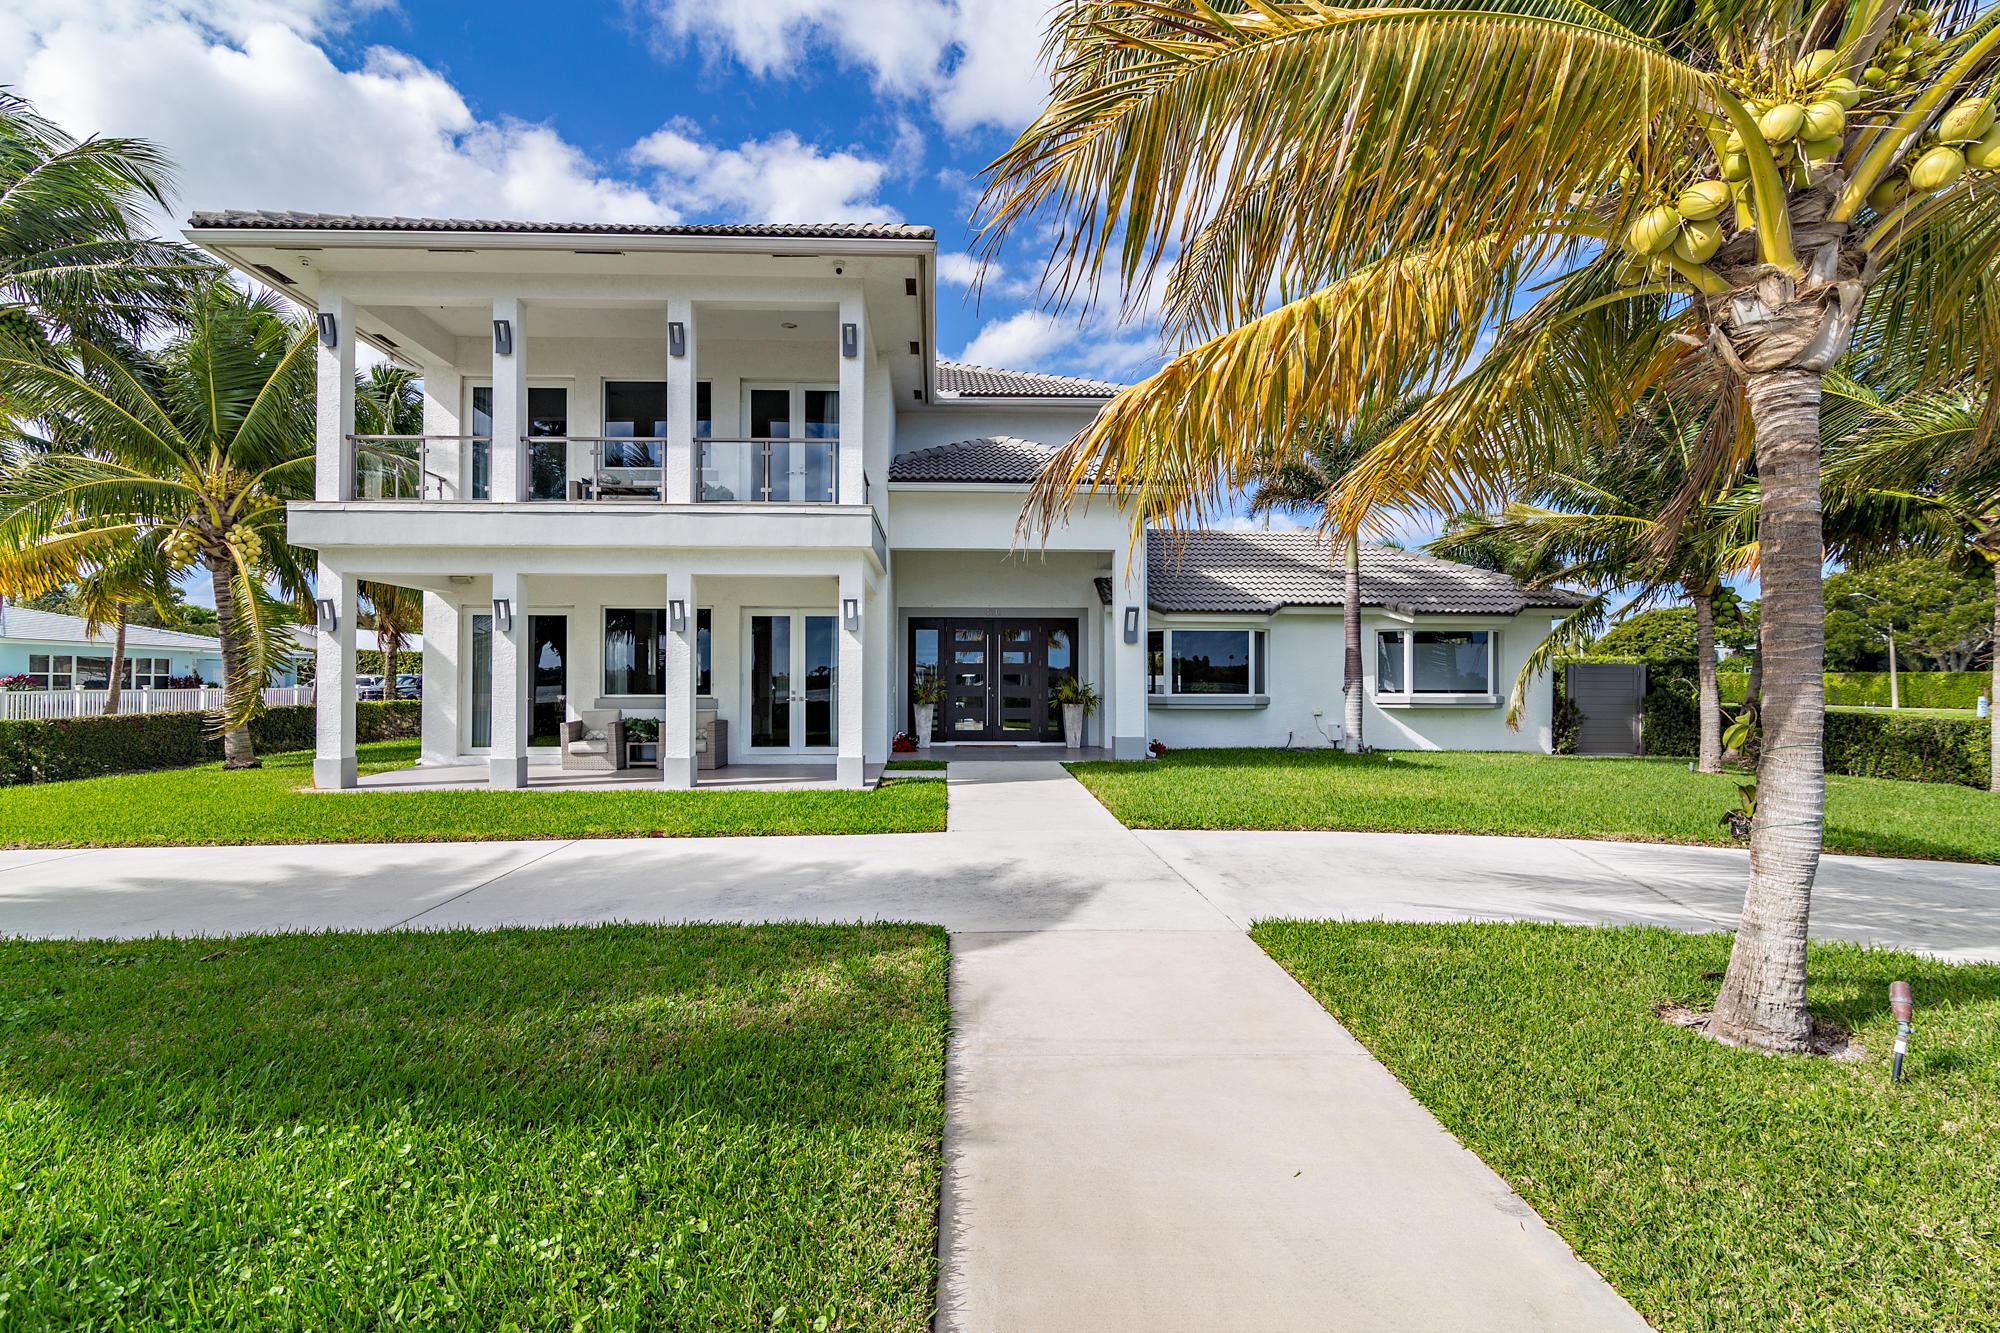 4515 Flagler Drive, West Palm Beach, Florida 33405, 5 Bedrooms Bedrooms, ,4.1 BathroomsBathrooms,Single Family,For Sale,Flagler,RX-10591735